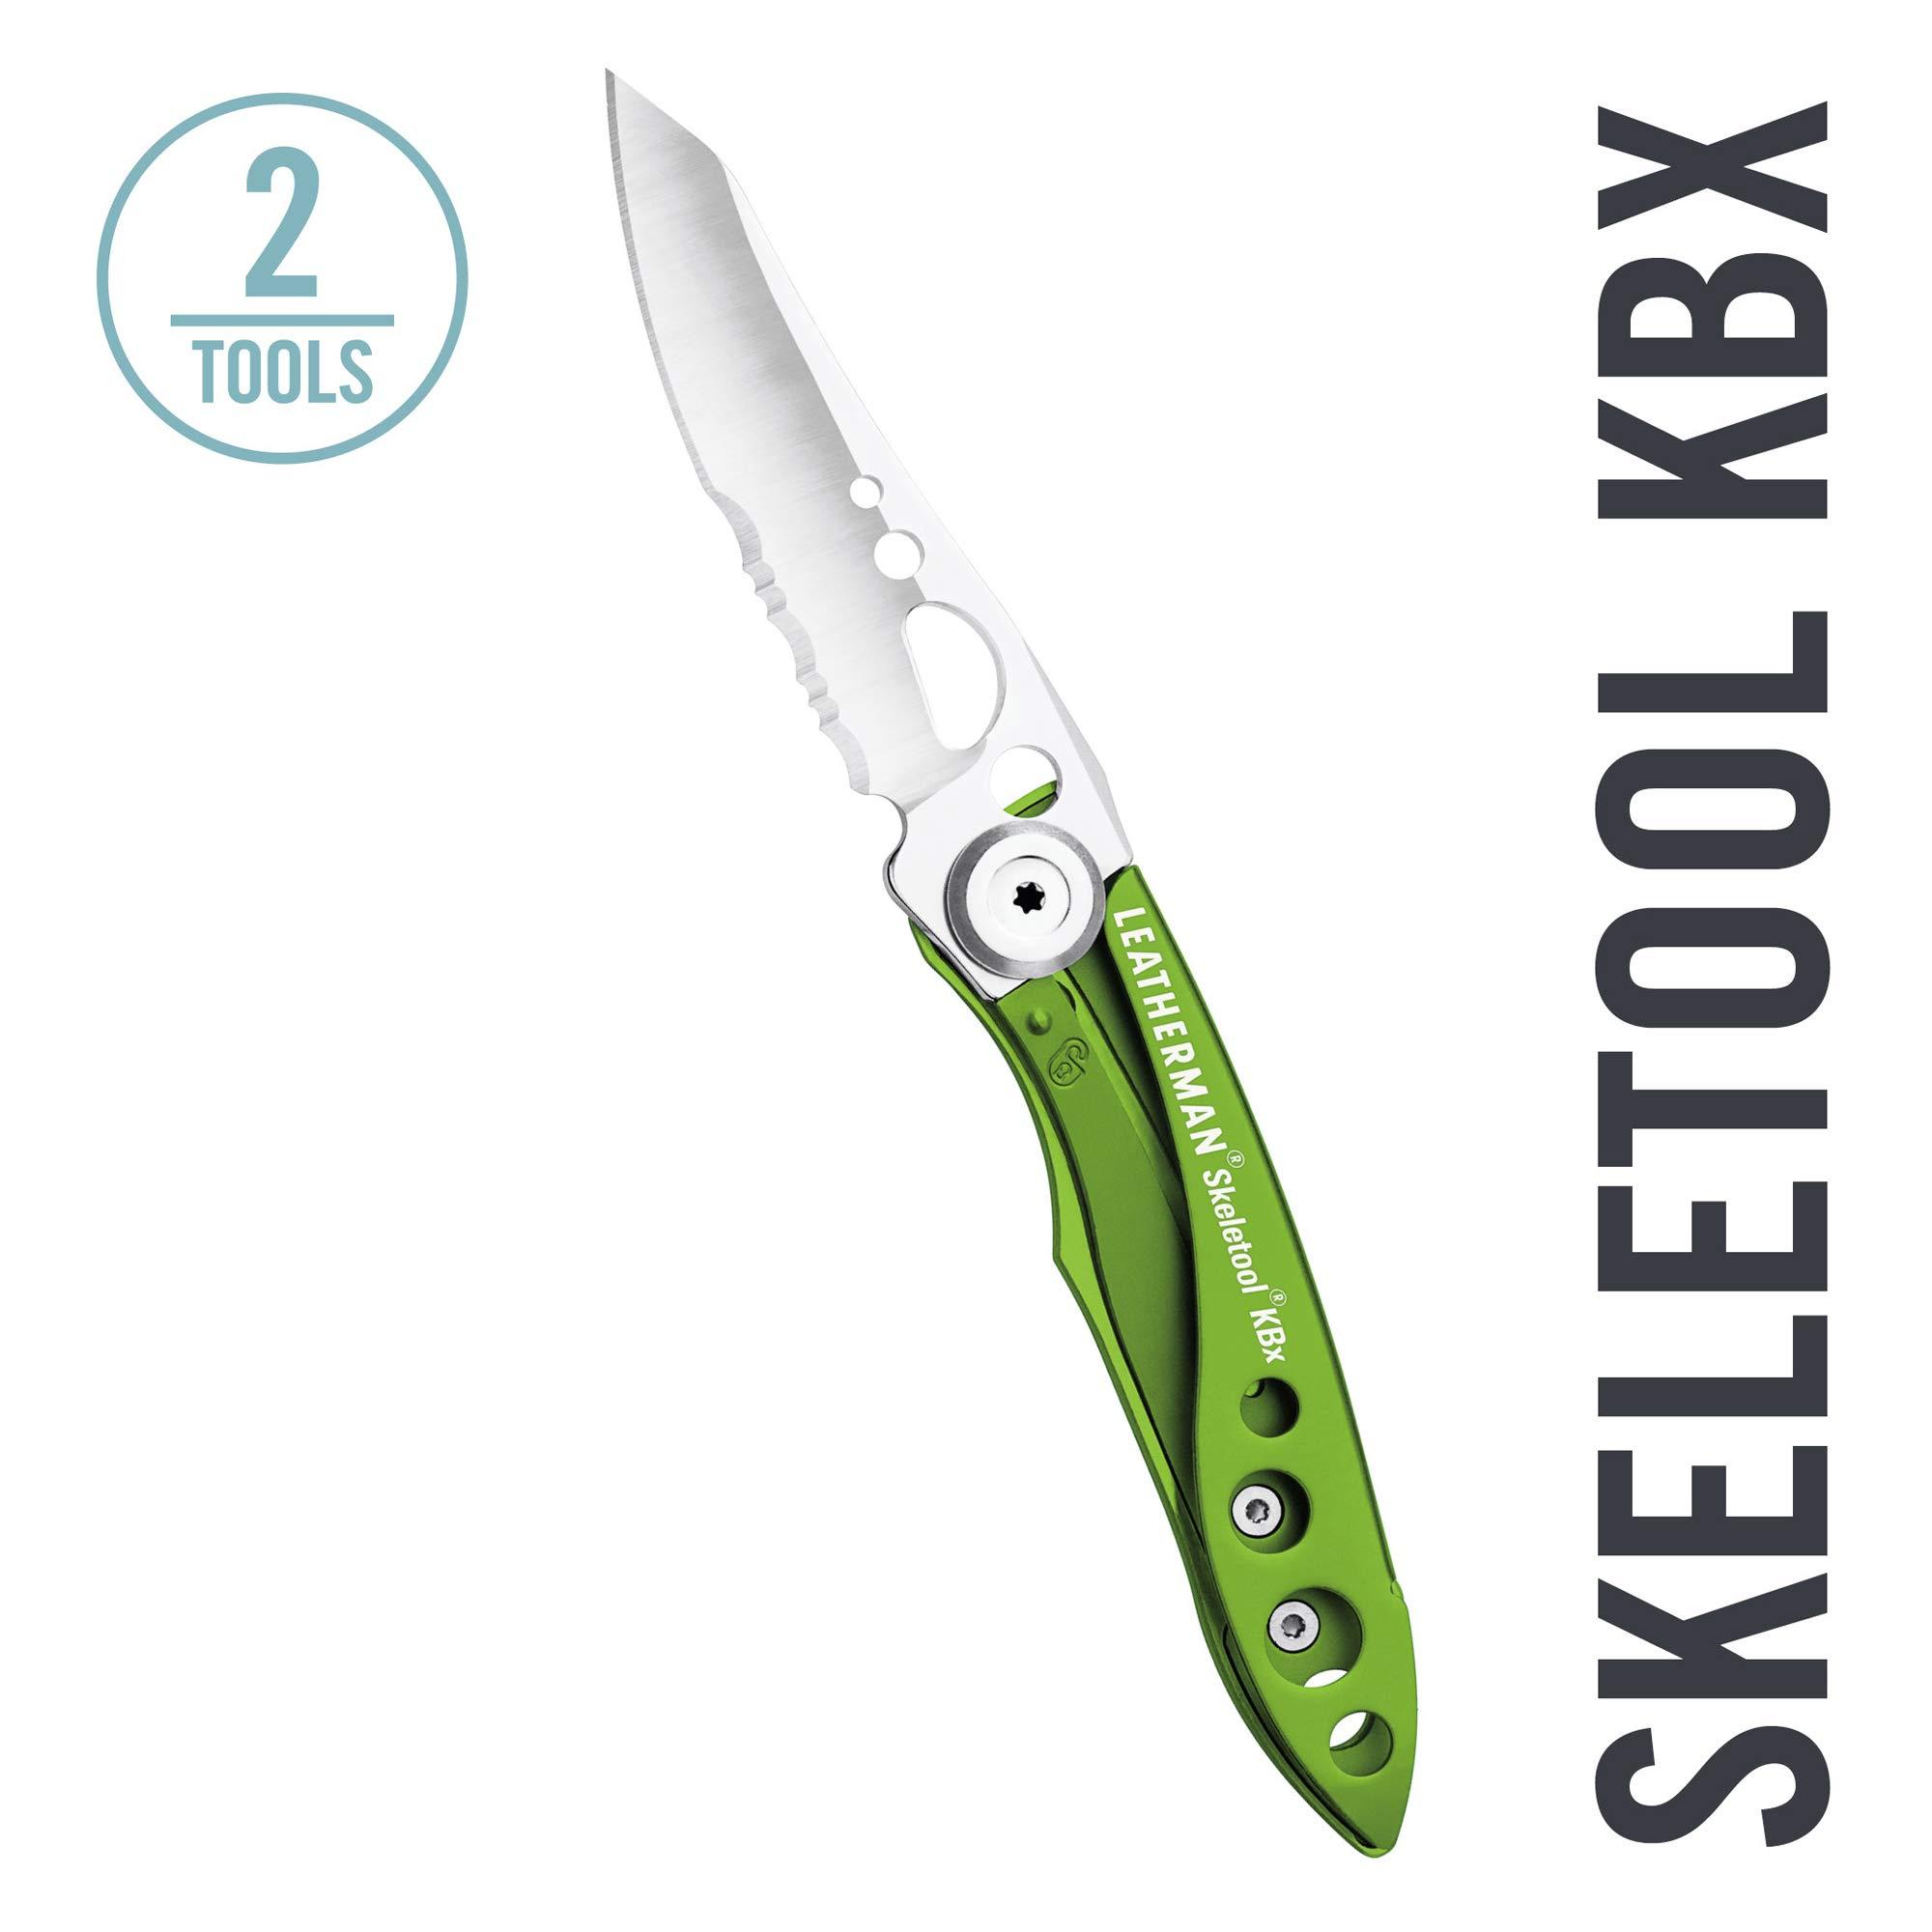 LEATHERMAN - Skeletool KBX Pocket Knife with Bottle Opener, Moss Green by LEATHERMAN (Image #1)